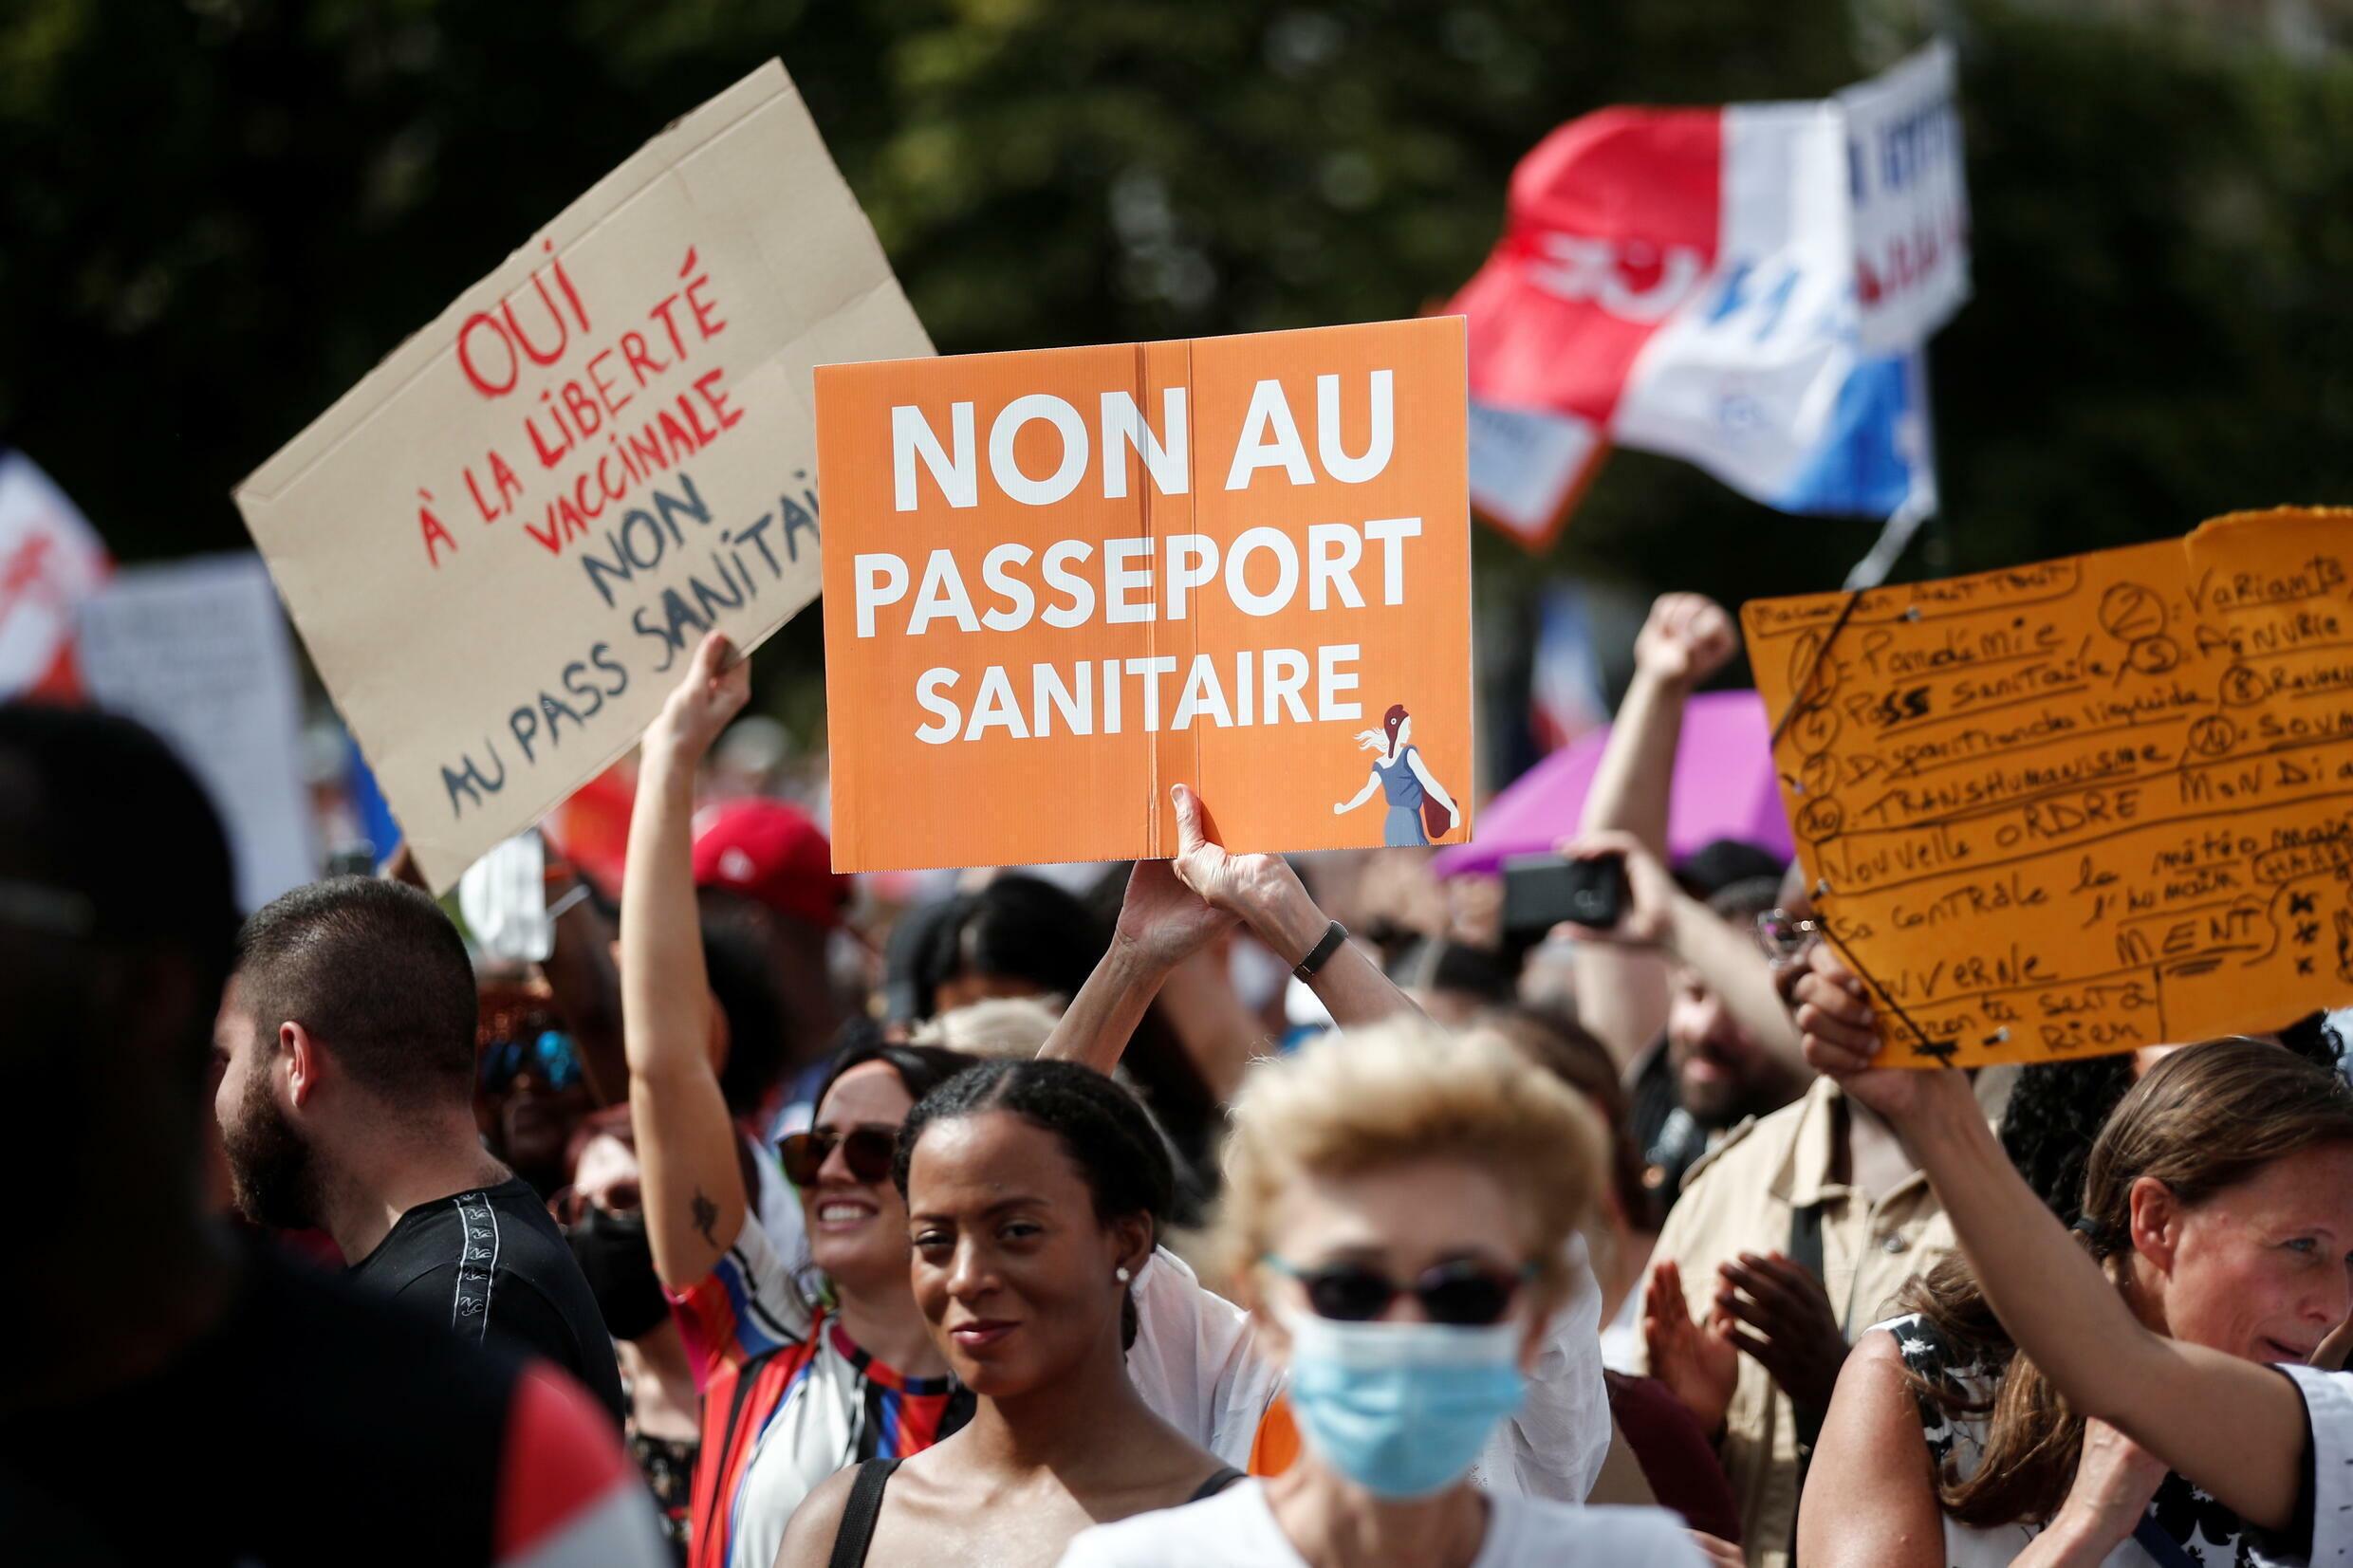 2021-07-24T164758Z_1192995933_RC22RO9J968A_RTRMADP_3_HEALTH-CORONAVIRUS-FRANCE-PROTEST